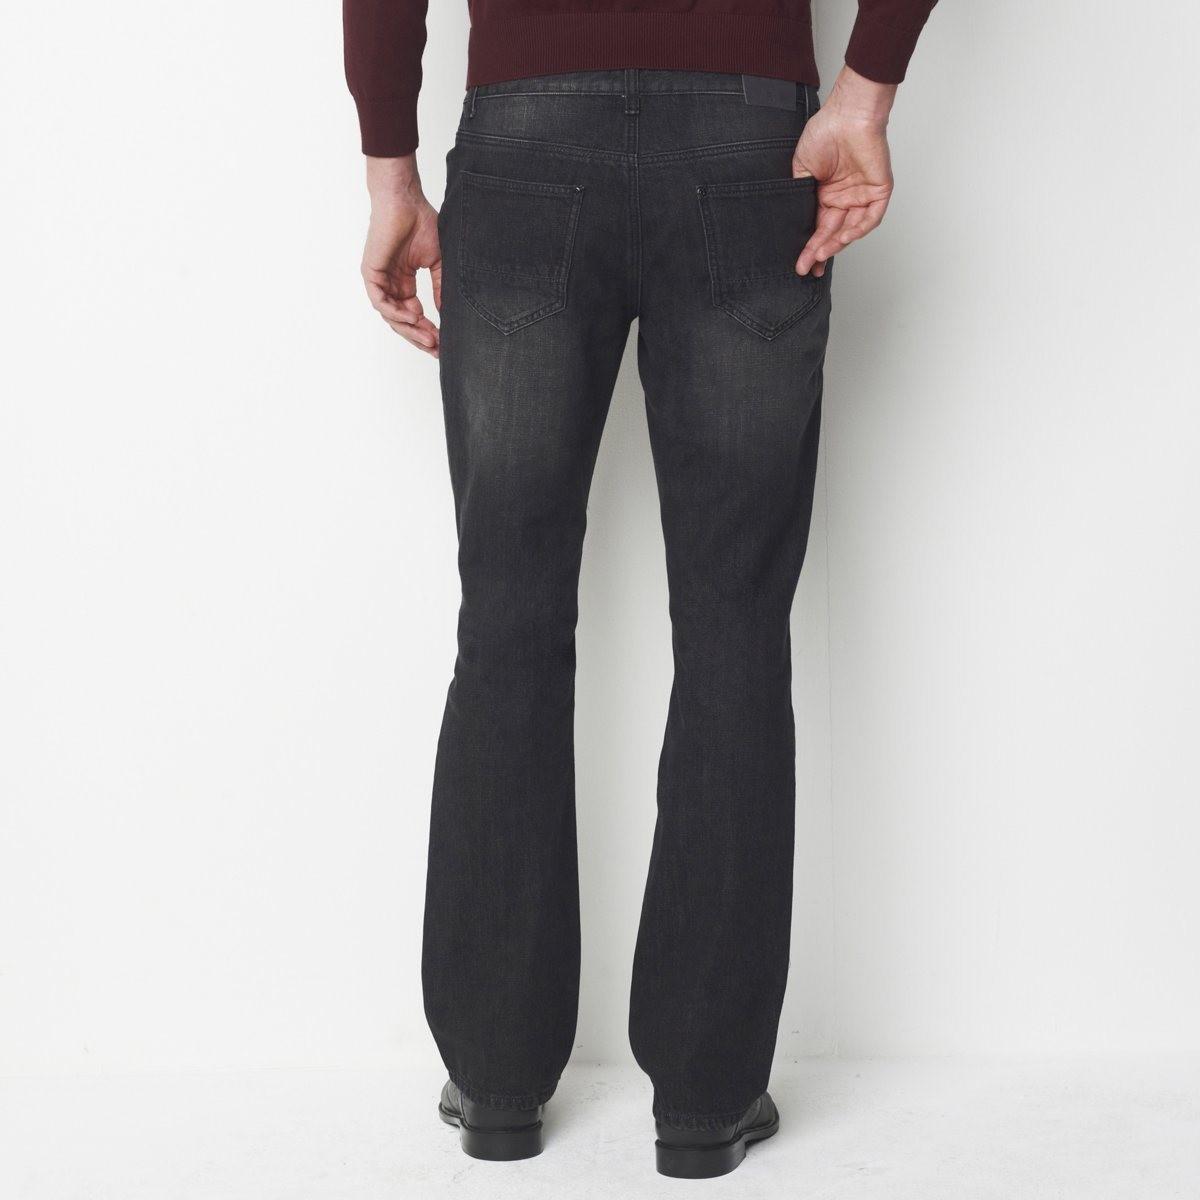 74c02d0a5184 Lyst - La Redoute Bootcut Jeans Length.34. in Black for Men